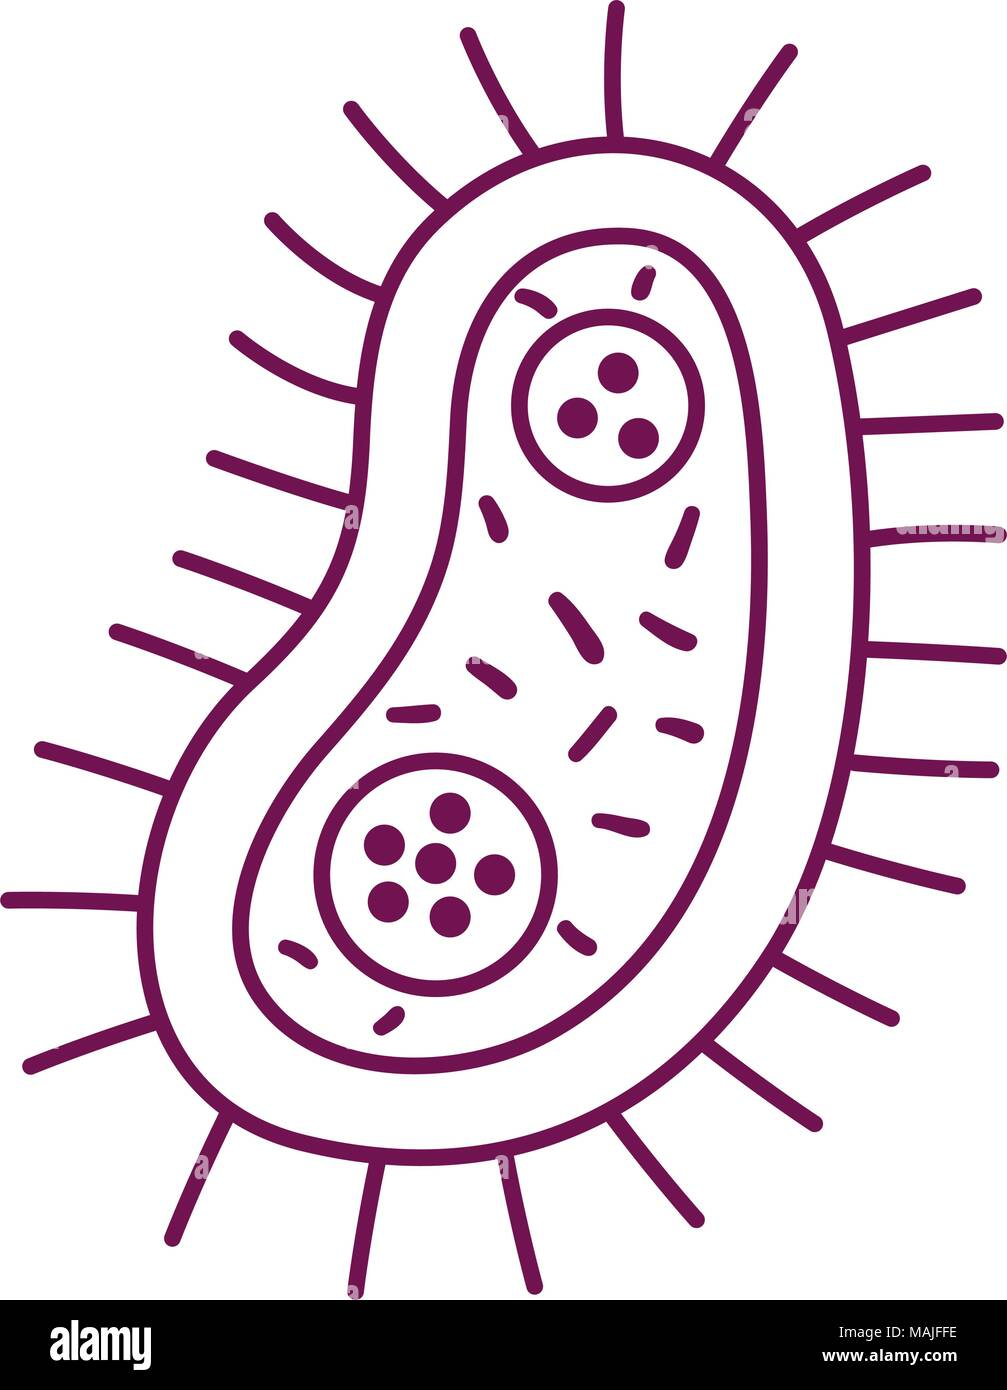 unicellular bacteria laboratory icon vector illustration design - Stock Image